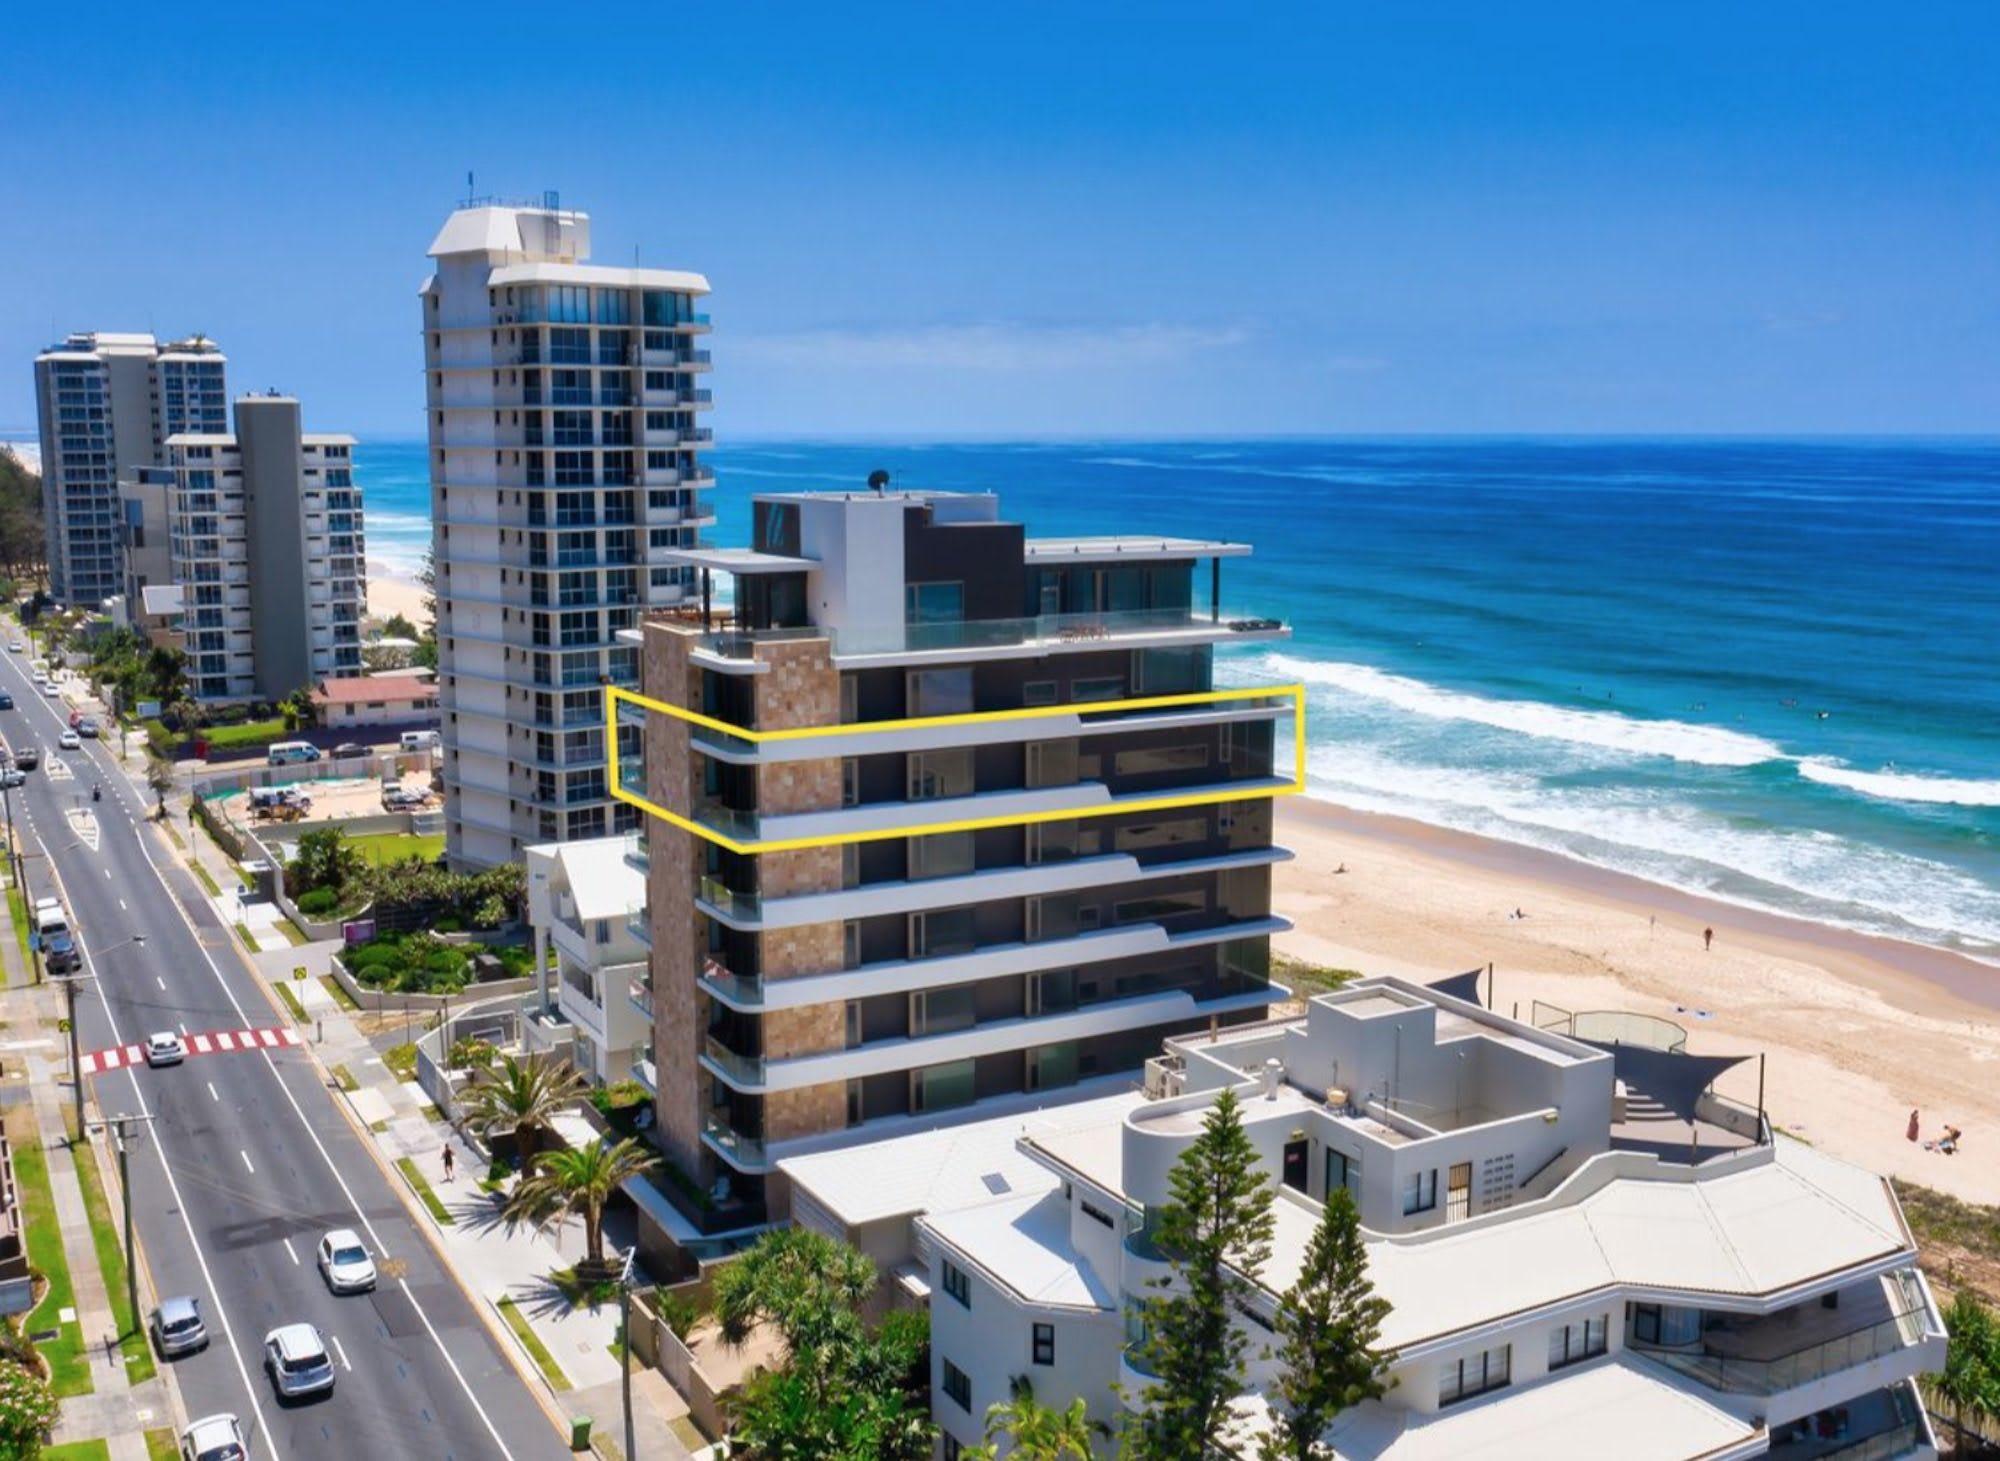 Main Beach apartment complex Sea secures $6.3 million sub-penthouse sale